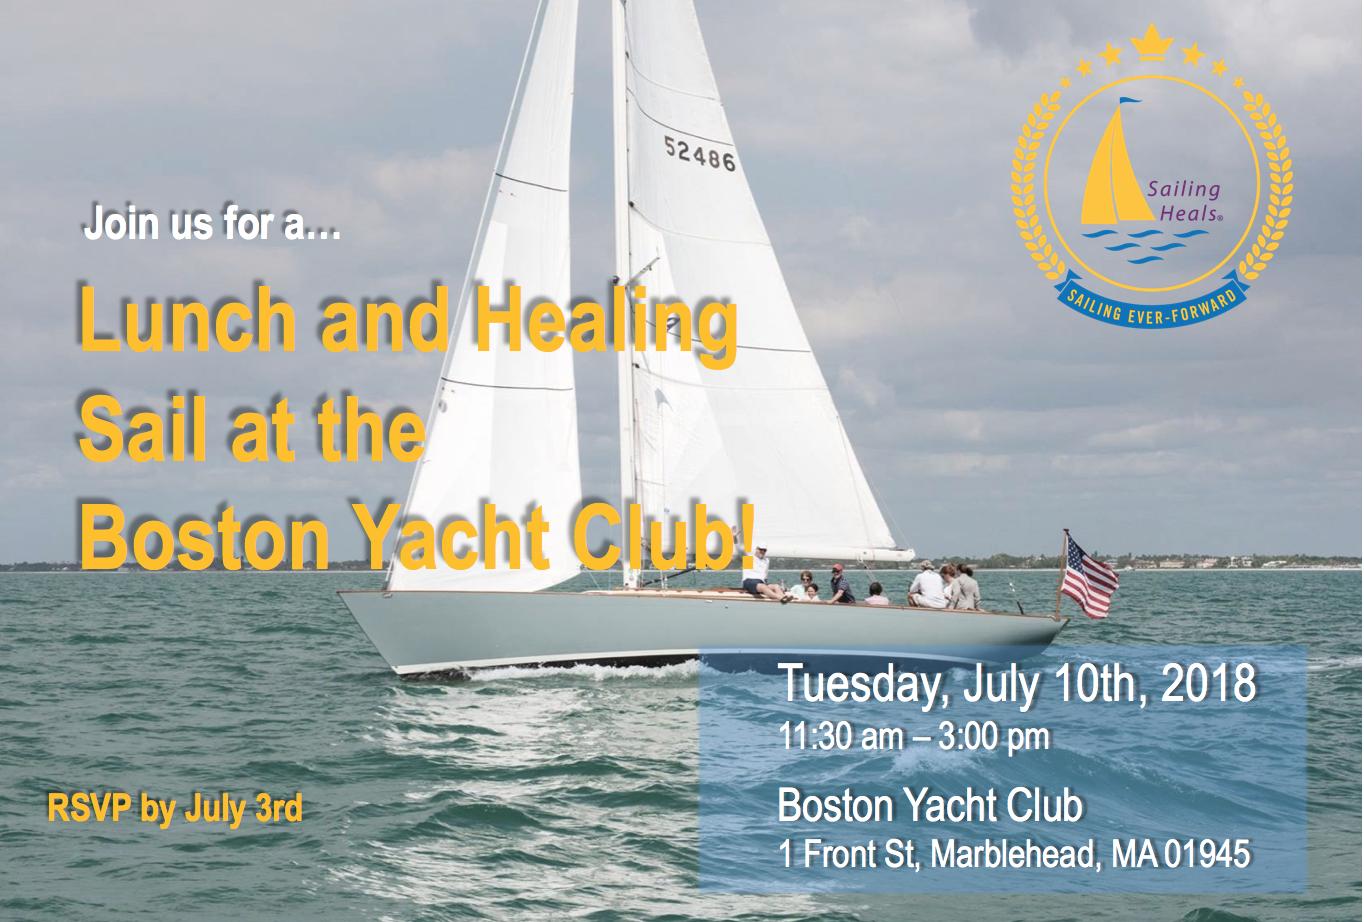 7/10/18 Boston Yacht Club Lunch and Healing Sail